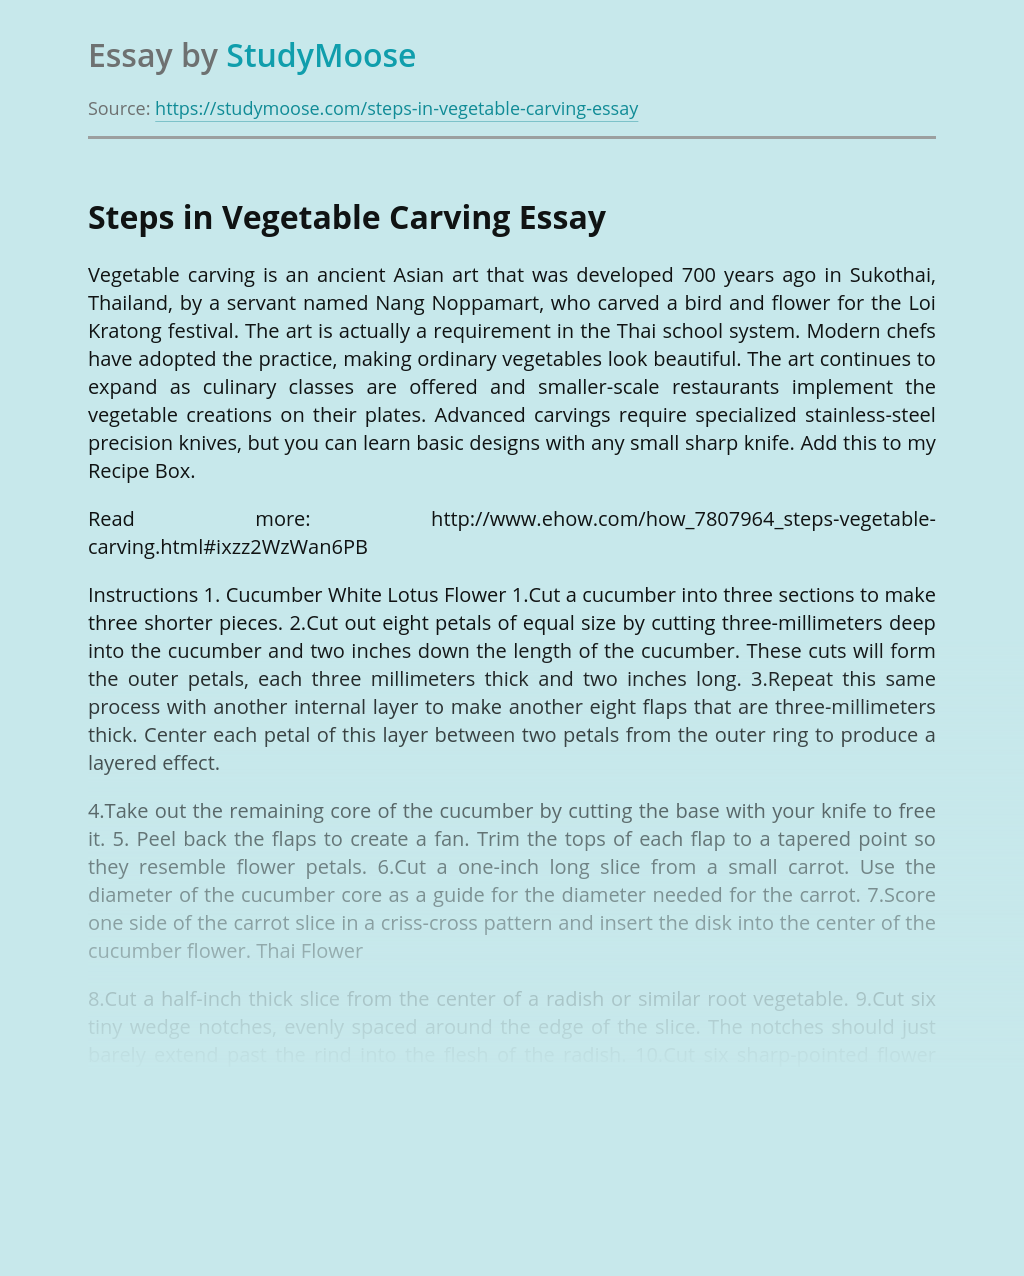 Steps in Vegetable Carving